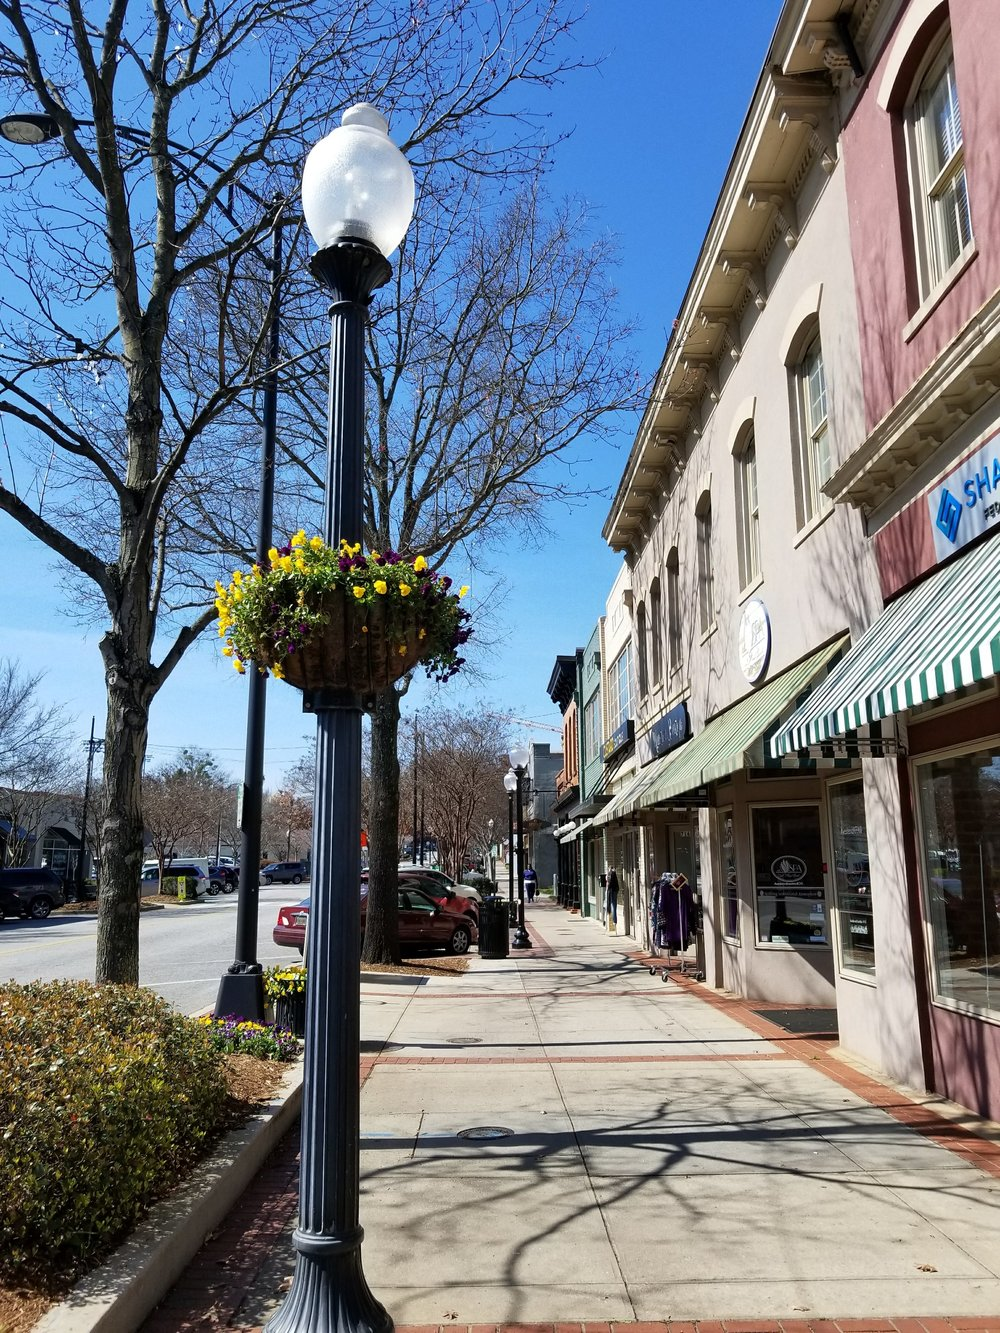 flower-baskets-downtown-greenville.jpg